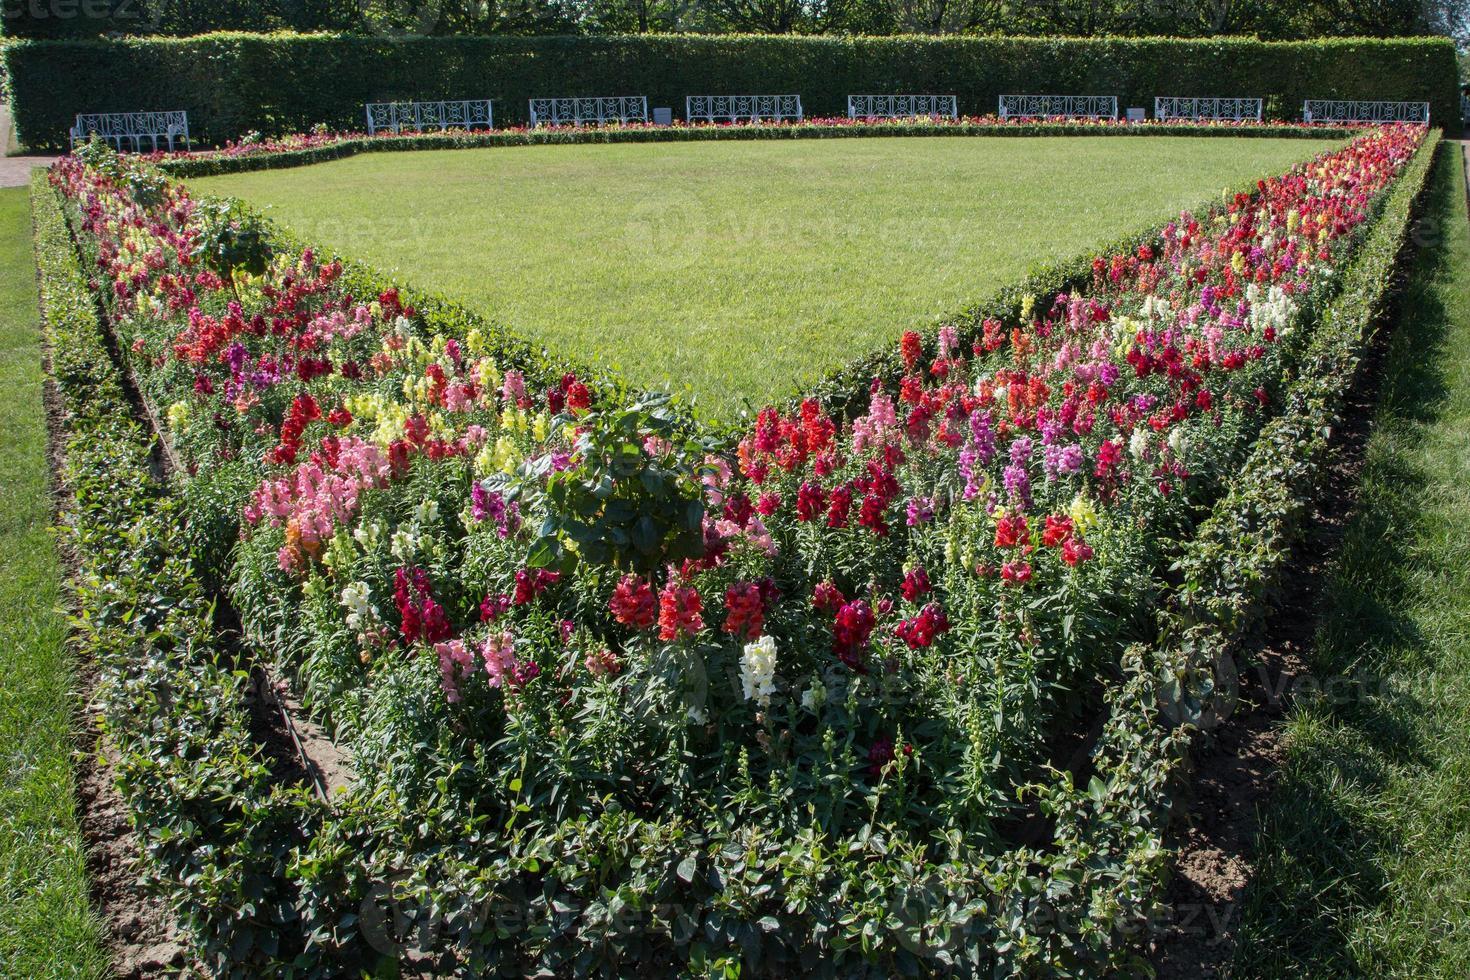 giardino formale con panchina bianca, st. Petersburg foto